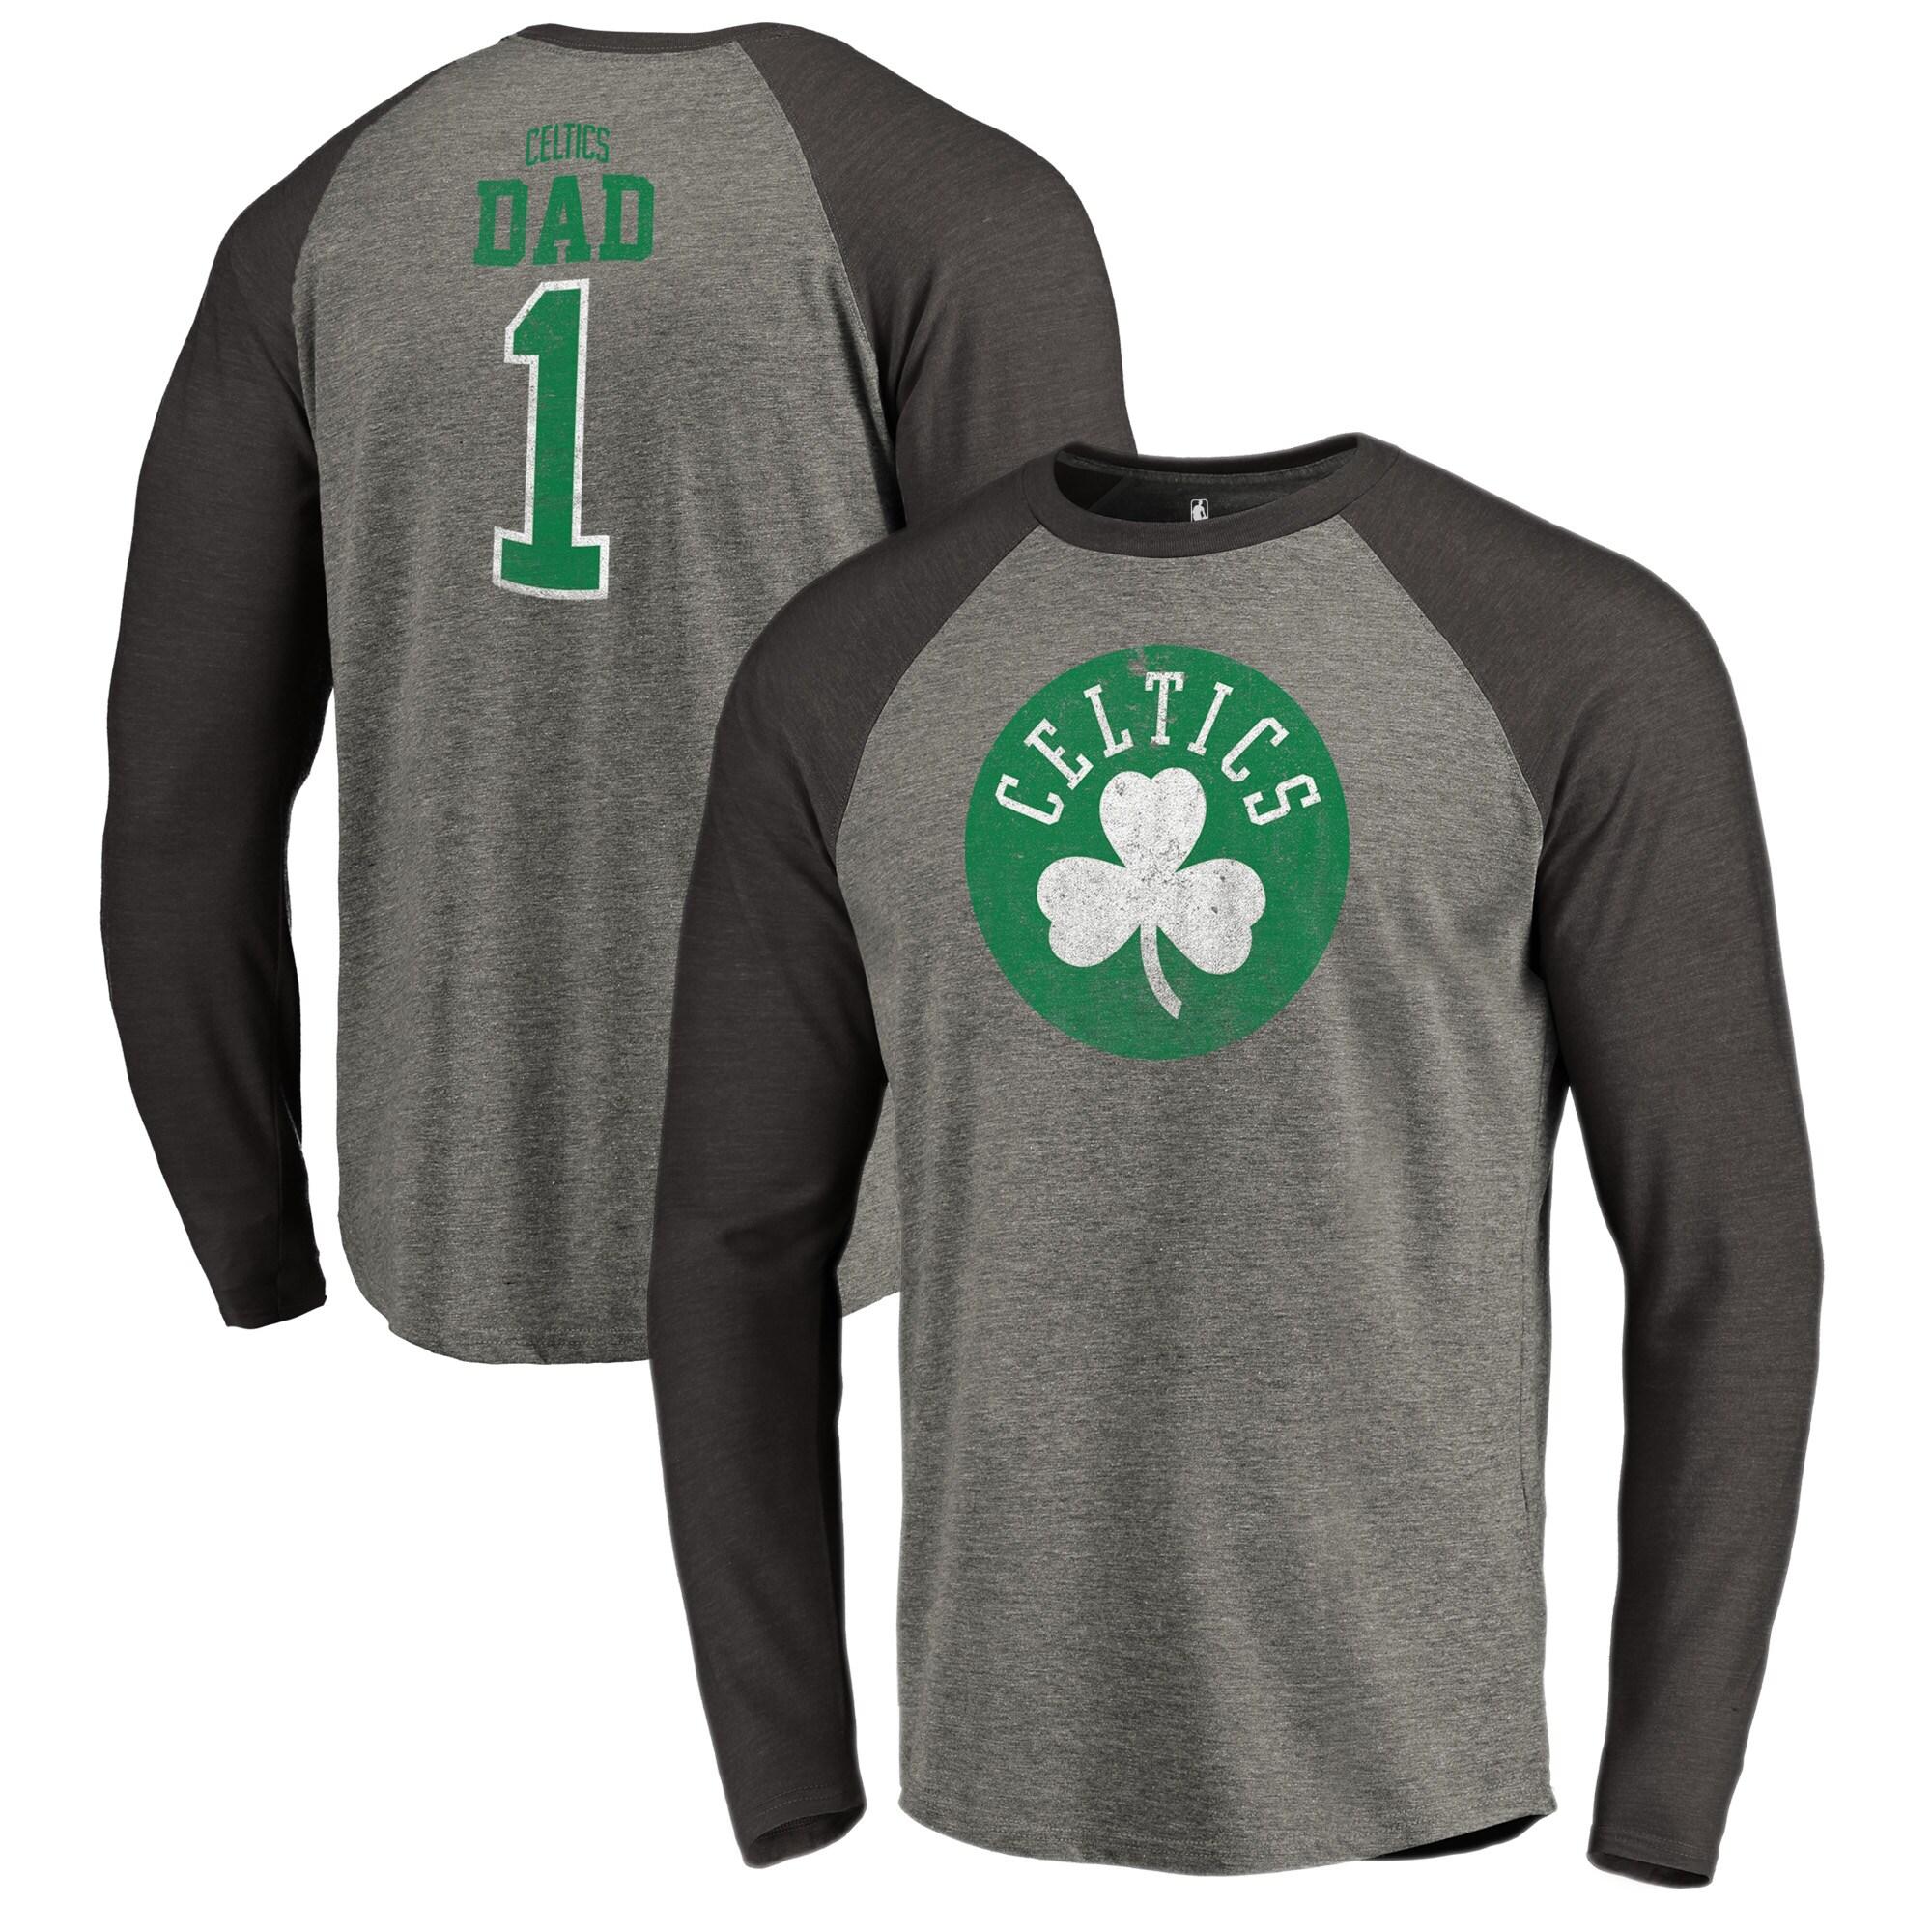 Boston Celtics Fanatics Branded Greatest Dad Long Sleeve Tri-Blend Raglan T-Shirt - Heathered Gray